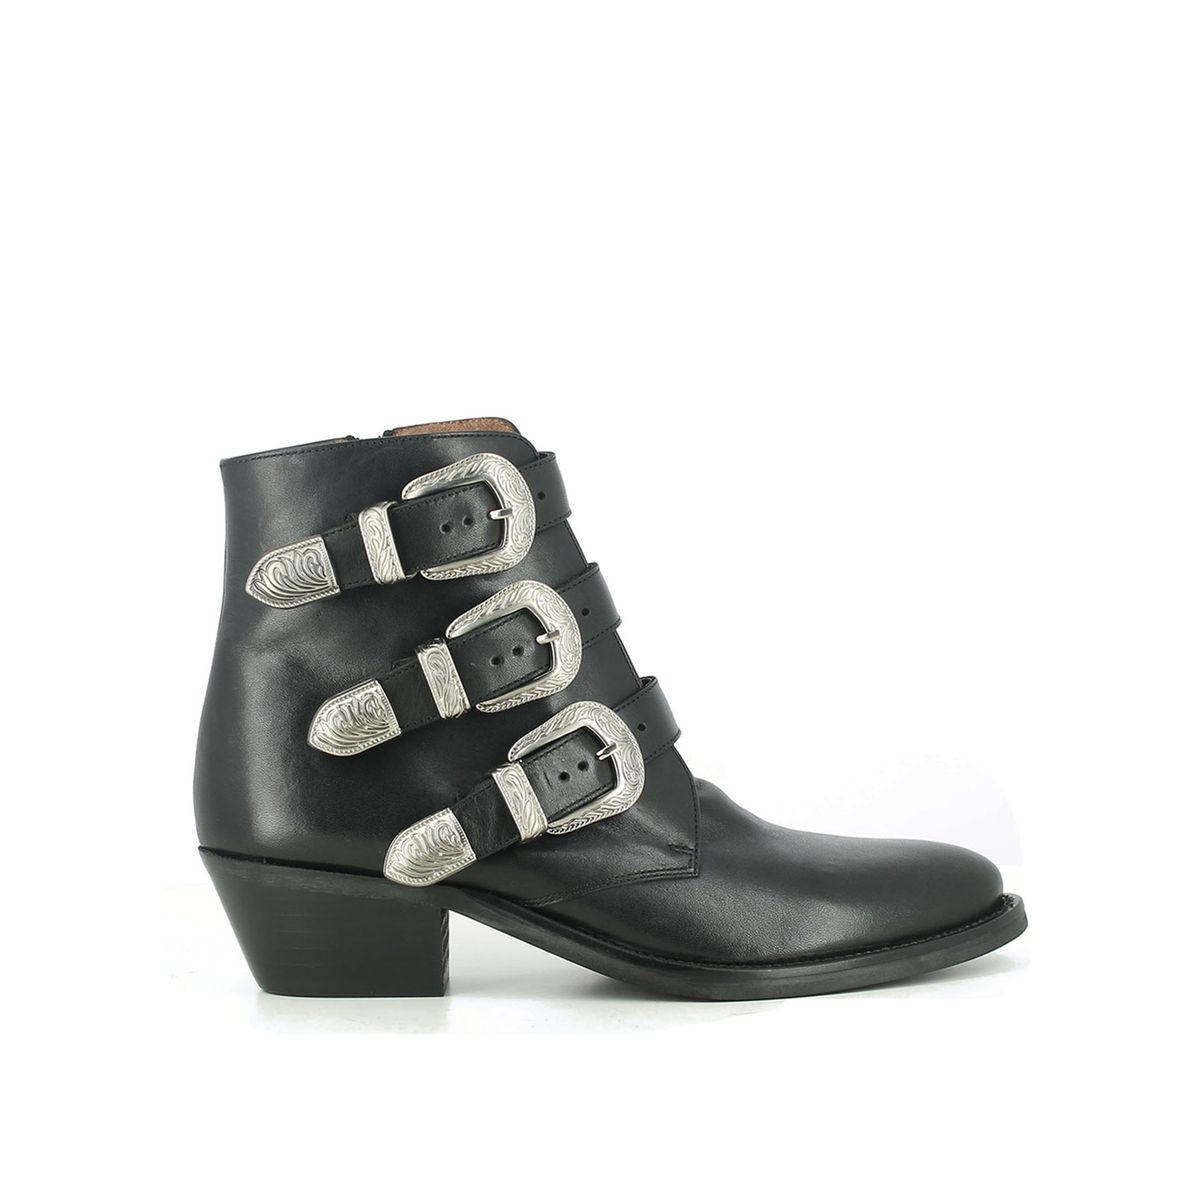 style cuir Boots santiag DyzaProducts en 2019Santiag 0wN8POnkX